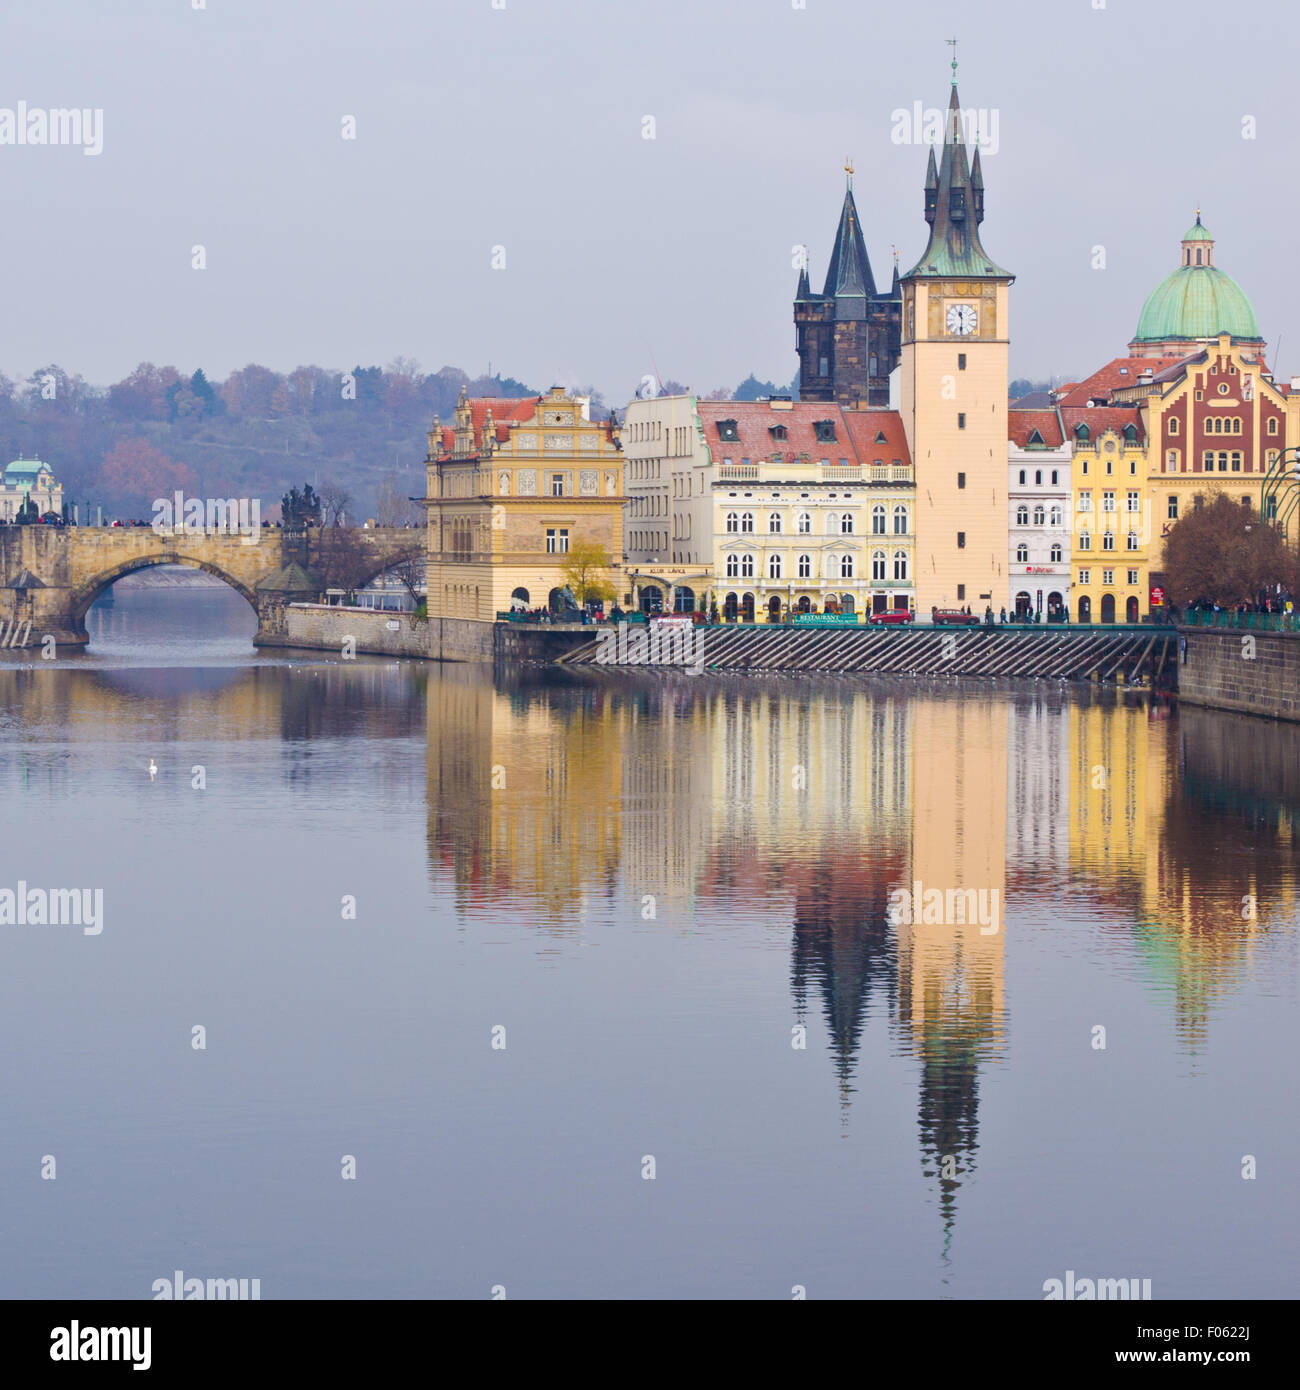 Charles Bridge, Karlovy Lazne and Lavka clock tower in Prague - Stock Image